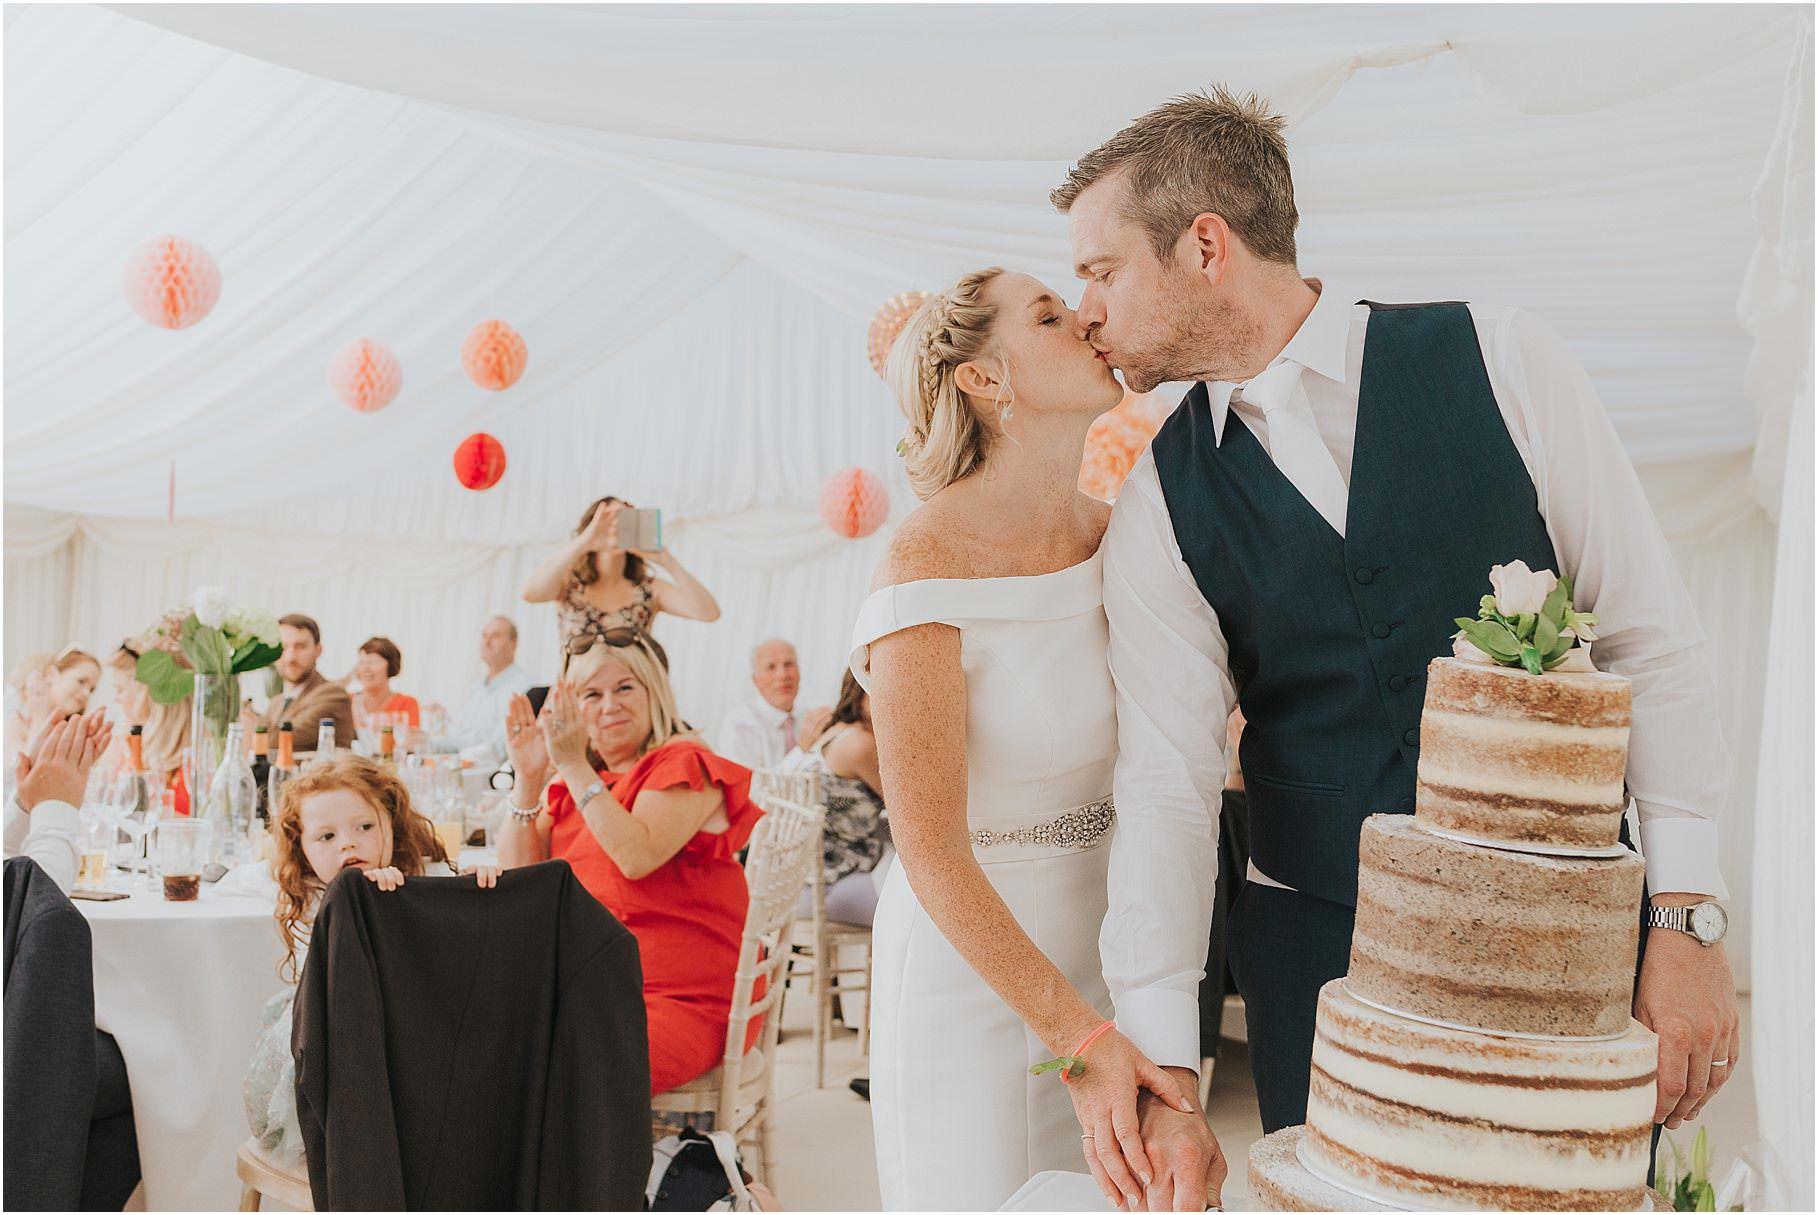 Cambridgeshire Wedding Photographer Black Horse Elton Wedding 1084 - Mr and Mrs Mac // CAMBRIDGESHIRE WEDDING